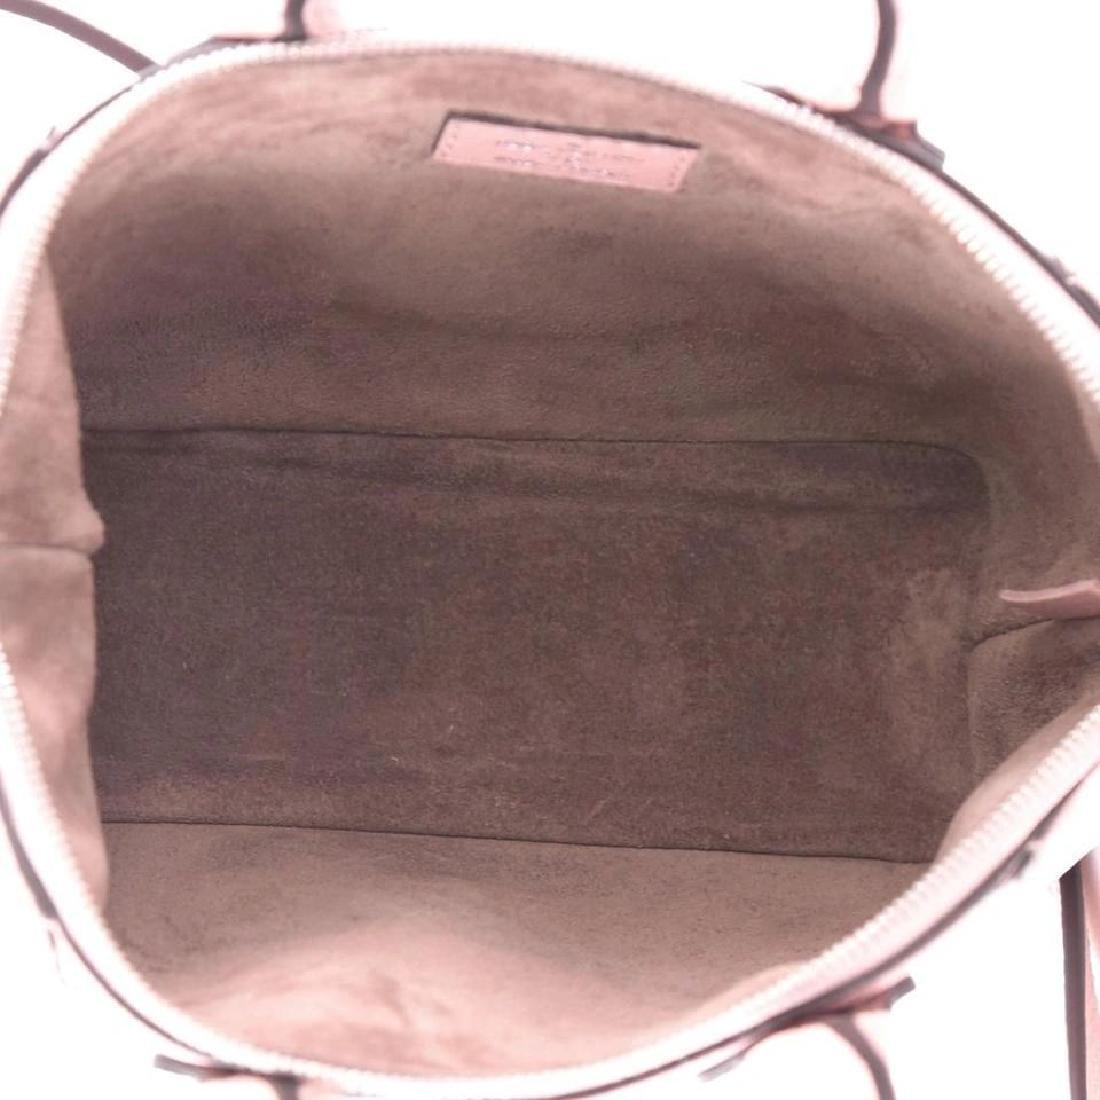 Louis Vuitton Soft Lockit Handbag Leather Nano - 8